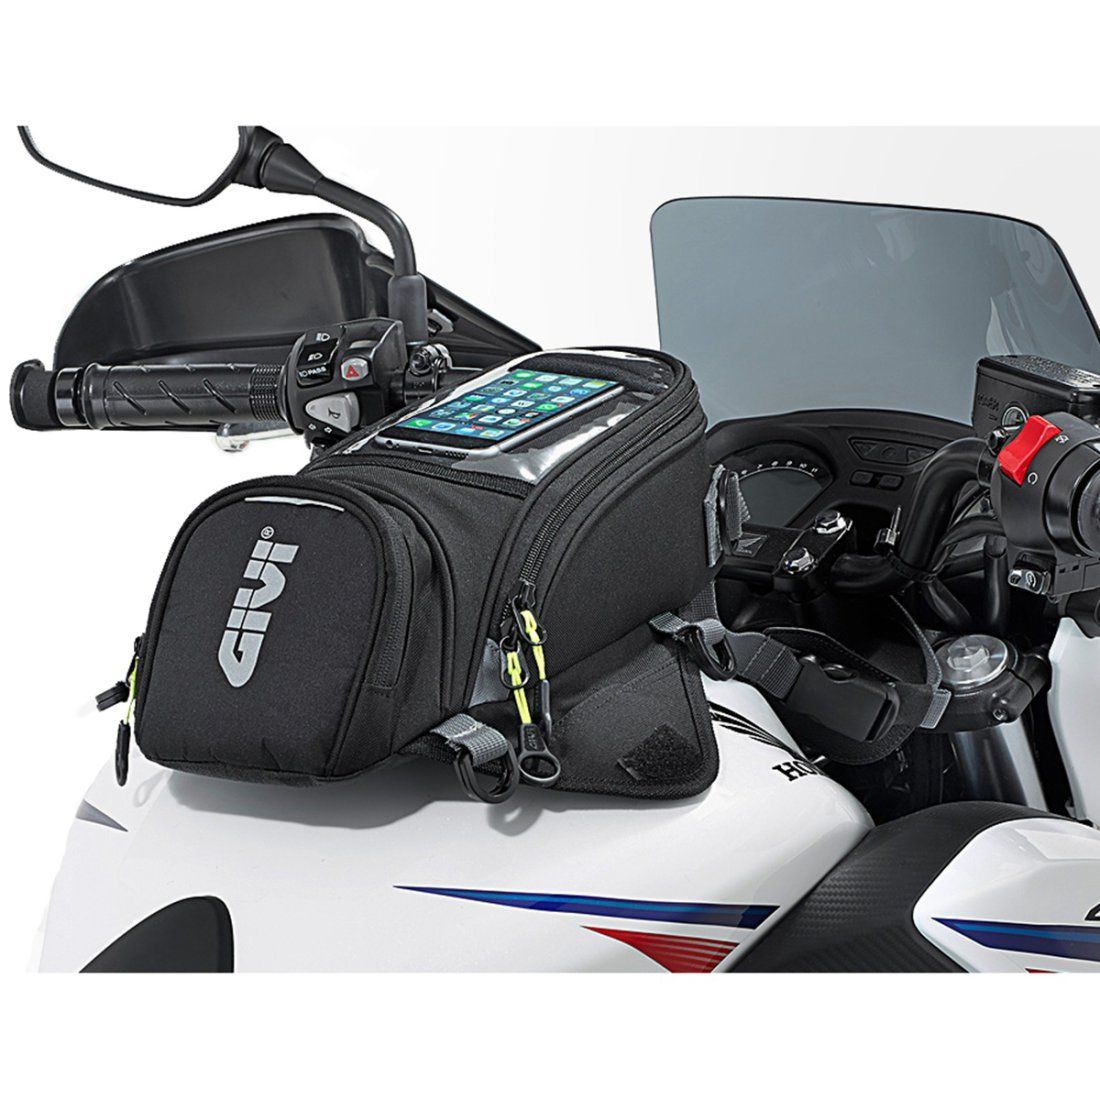 Bolsa Tanque 6 Litros Givi EA106B Encaixe Magnético Tela Touch 7 Polegadas + Capa Impermeável